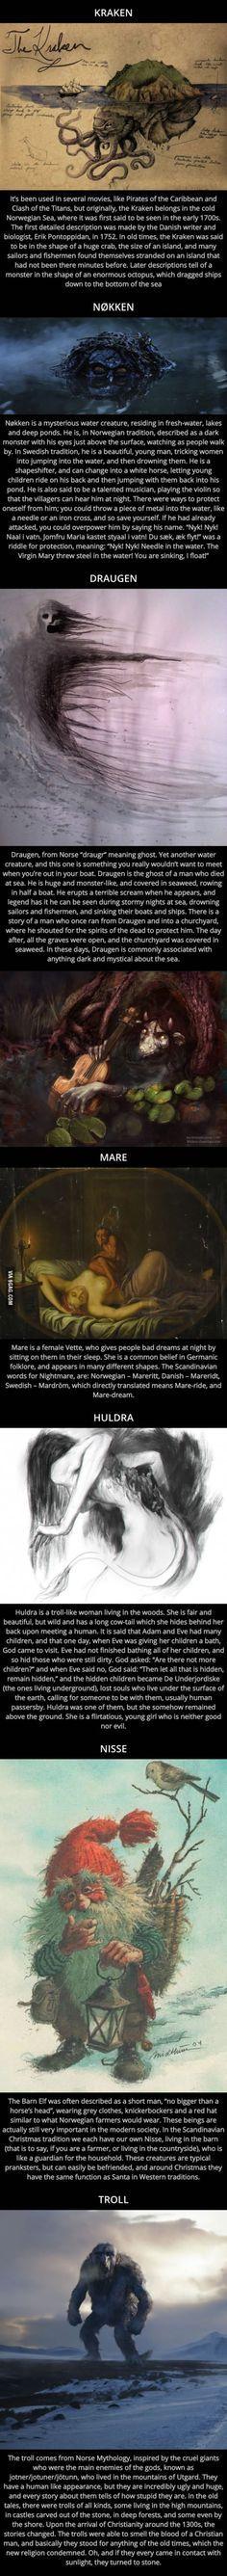 Nordic folklore